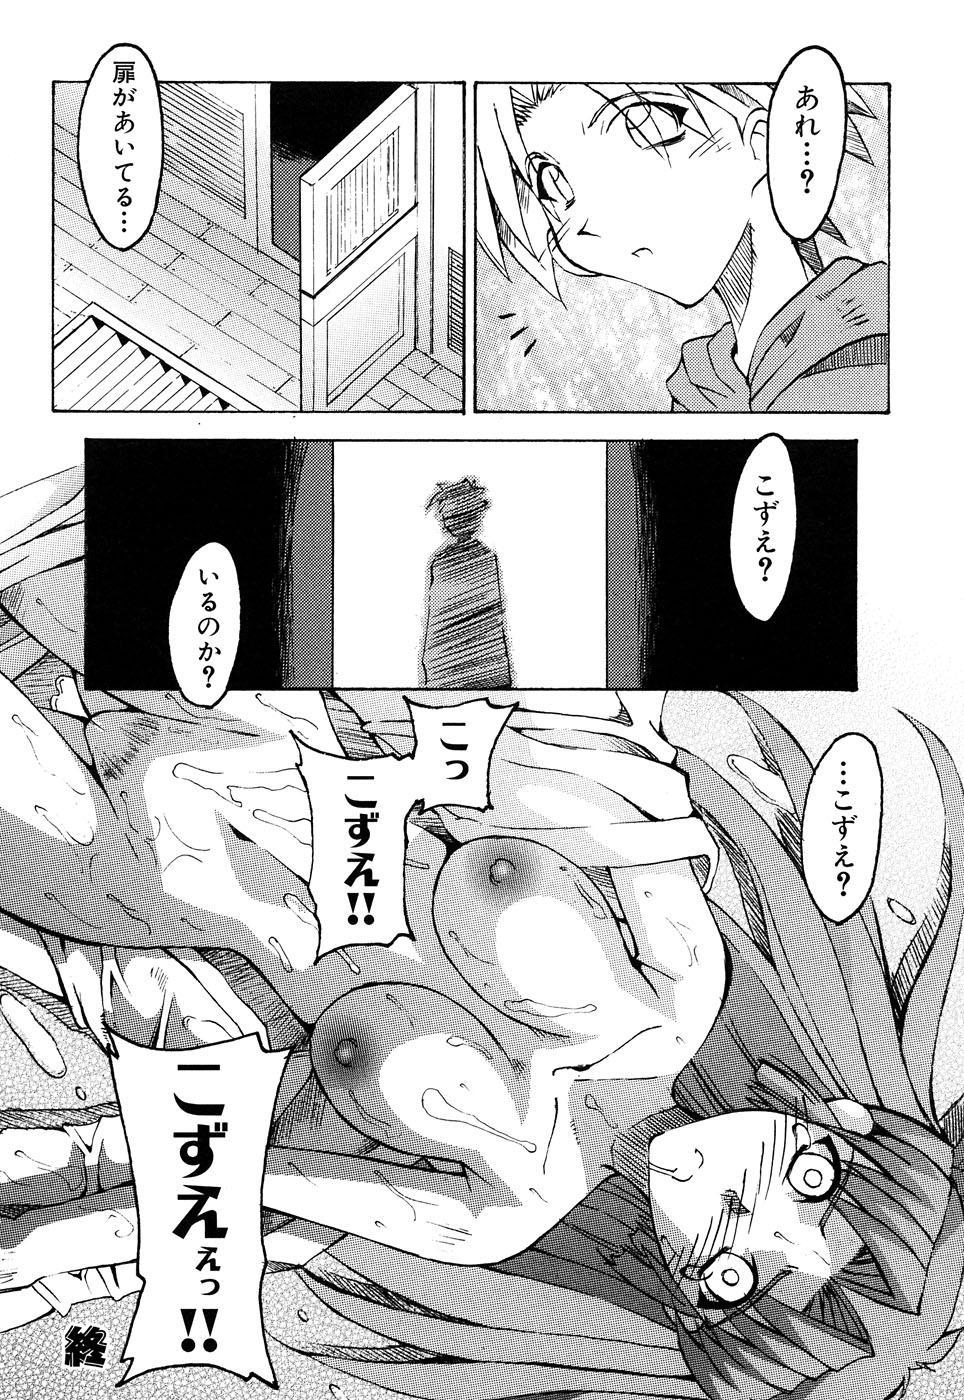 Fechikko VS Series ROUND.2 Miko San VS Maid San 36